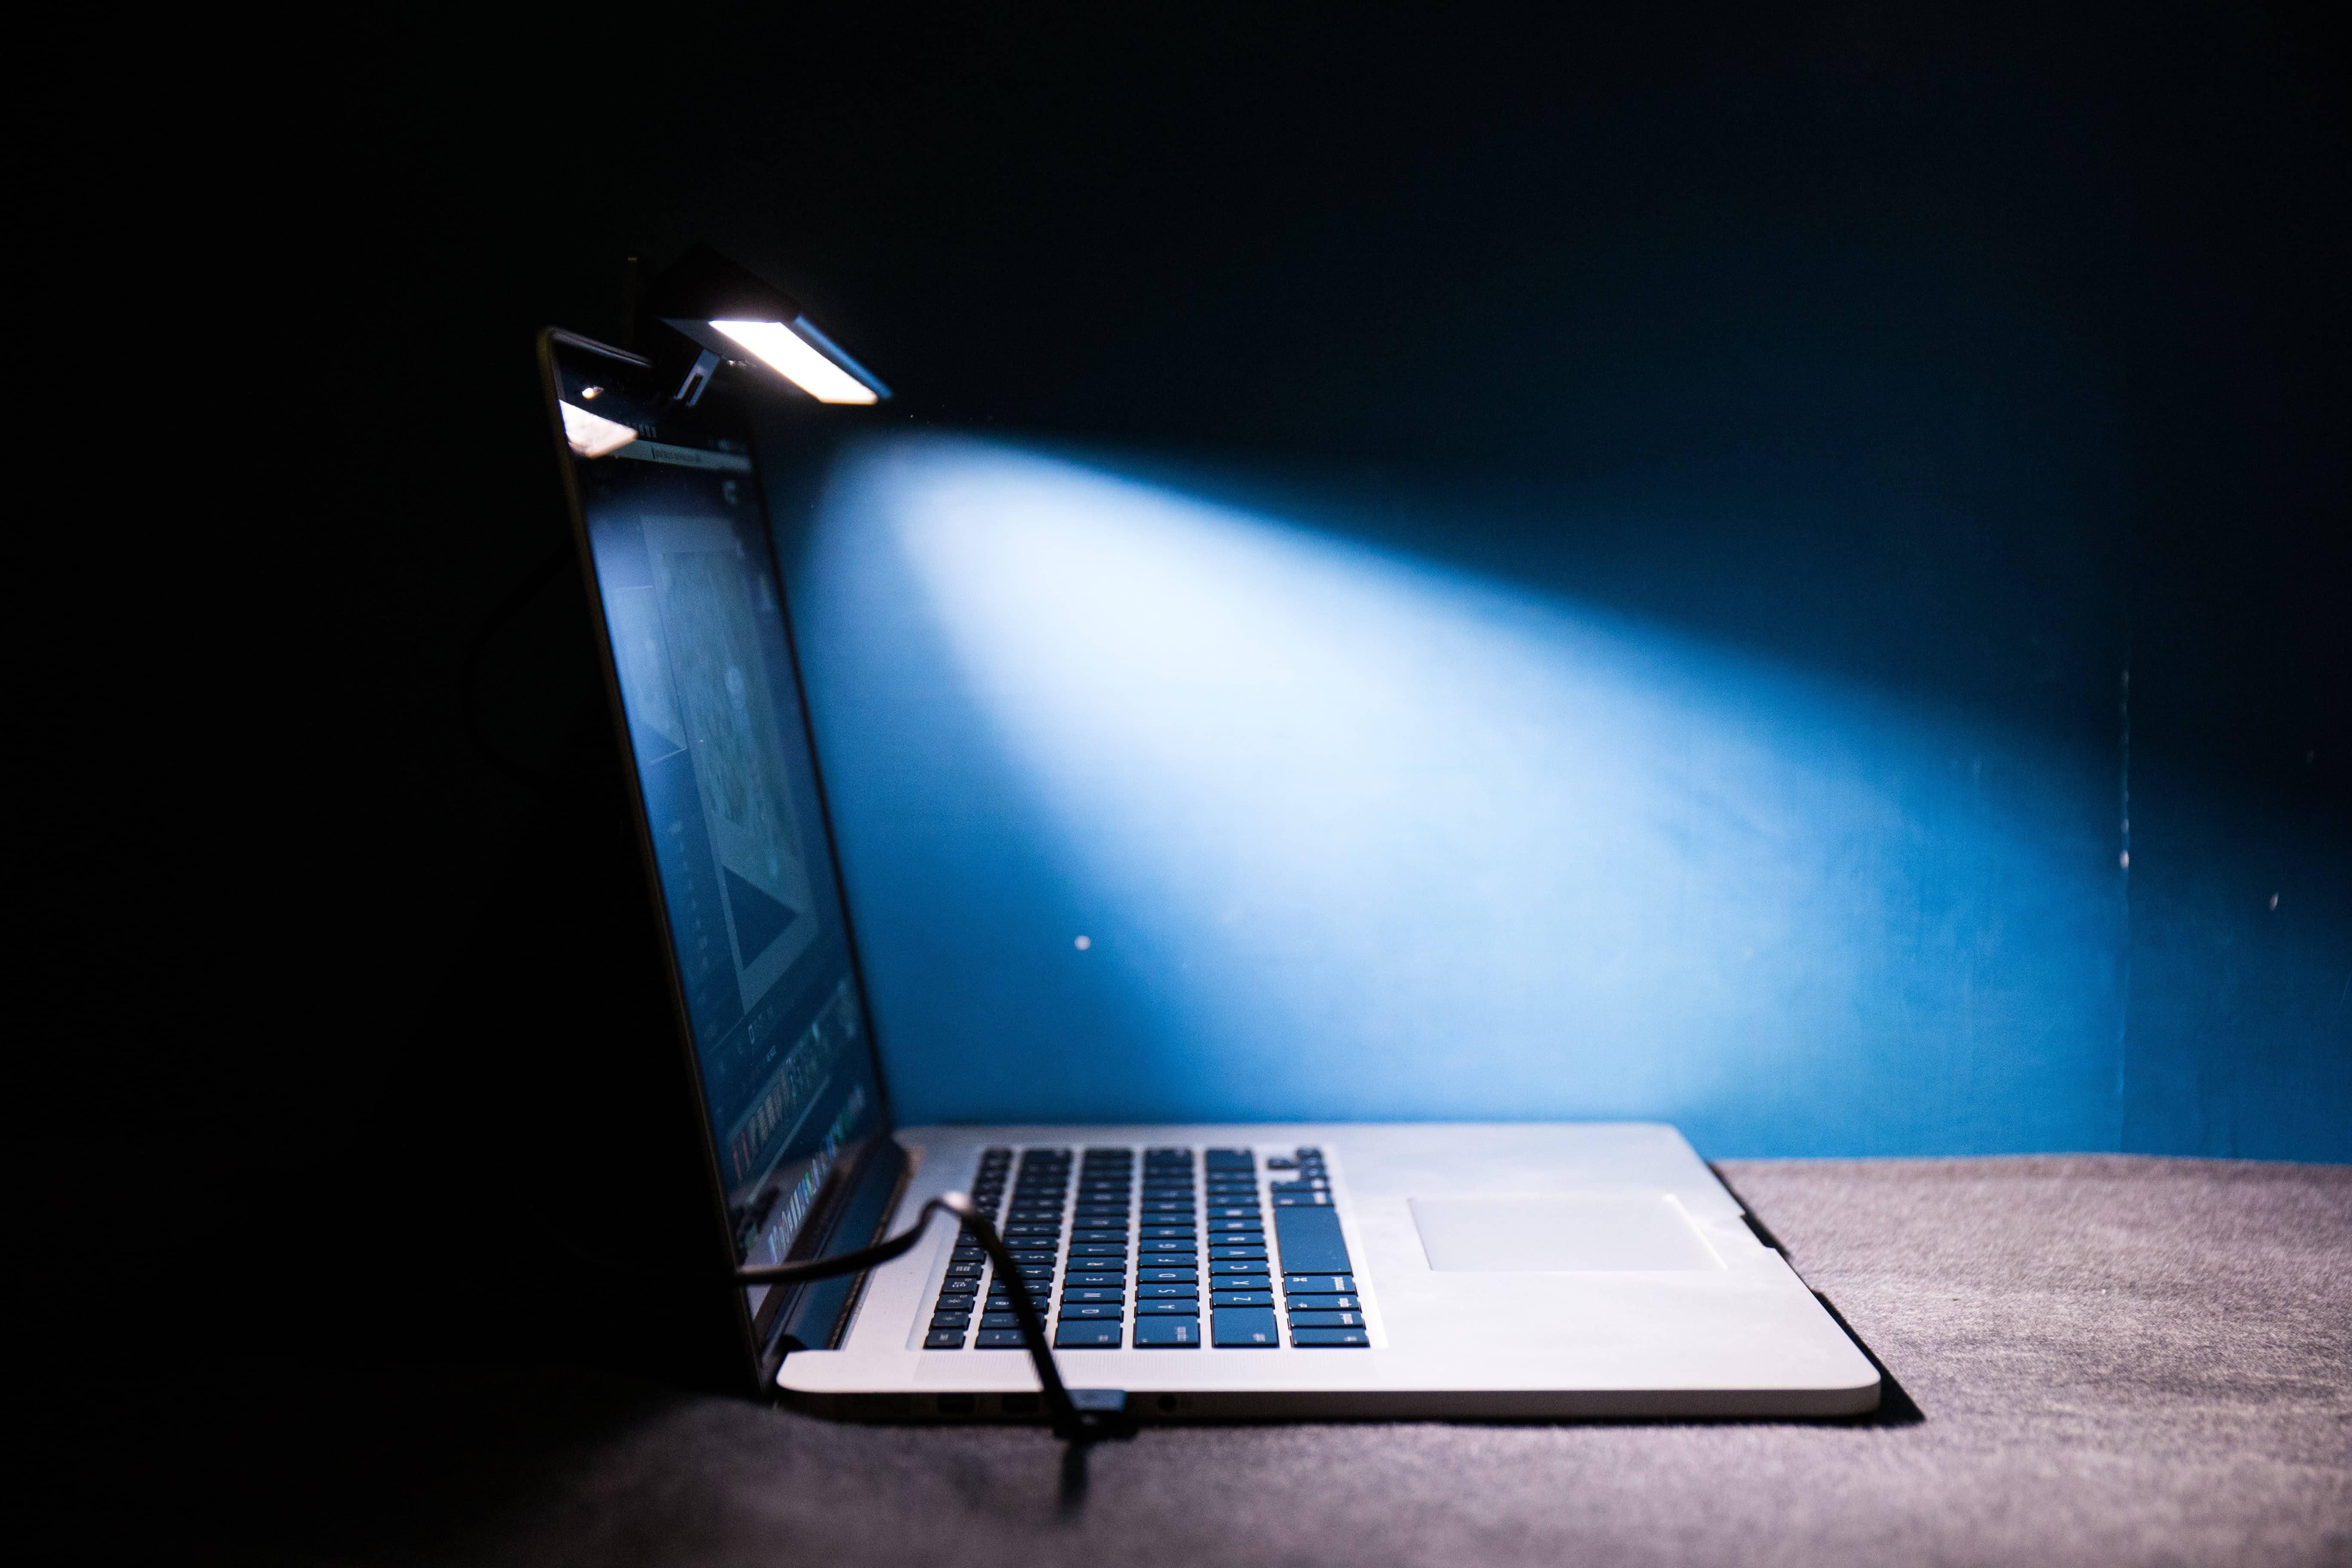 LED護眼再升級?輕巧便攜的筆電智能掛燈-BenQ WiT ScreenBar Lite-TechTeller (科技說)